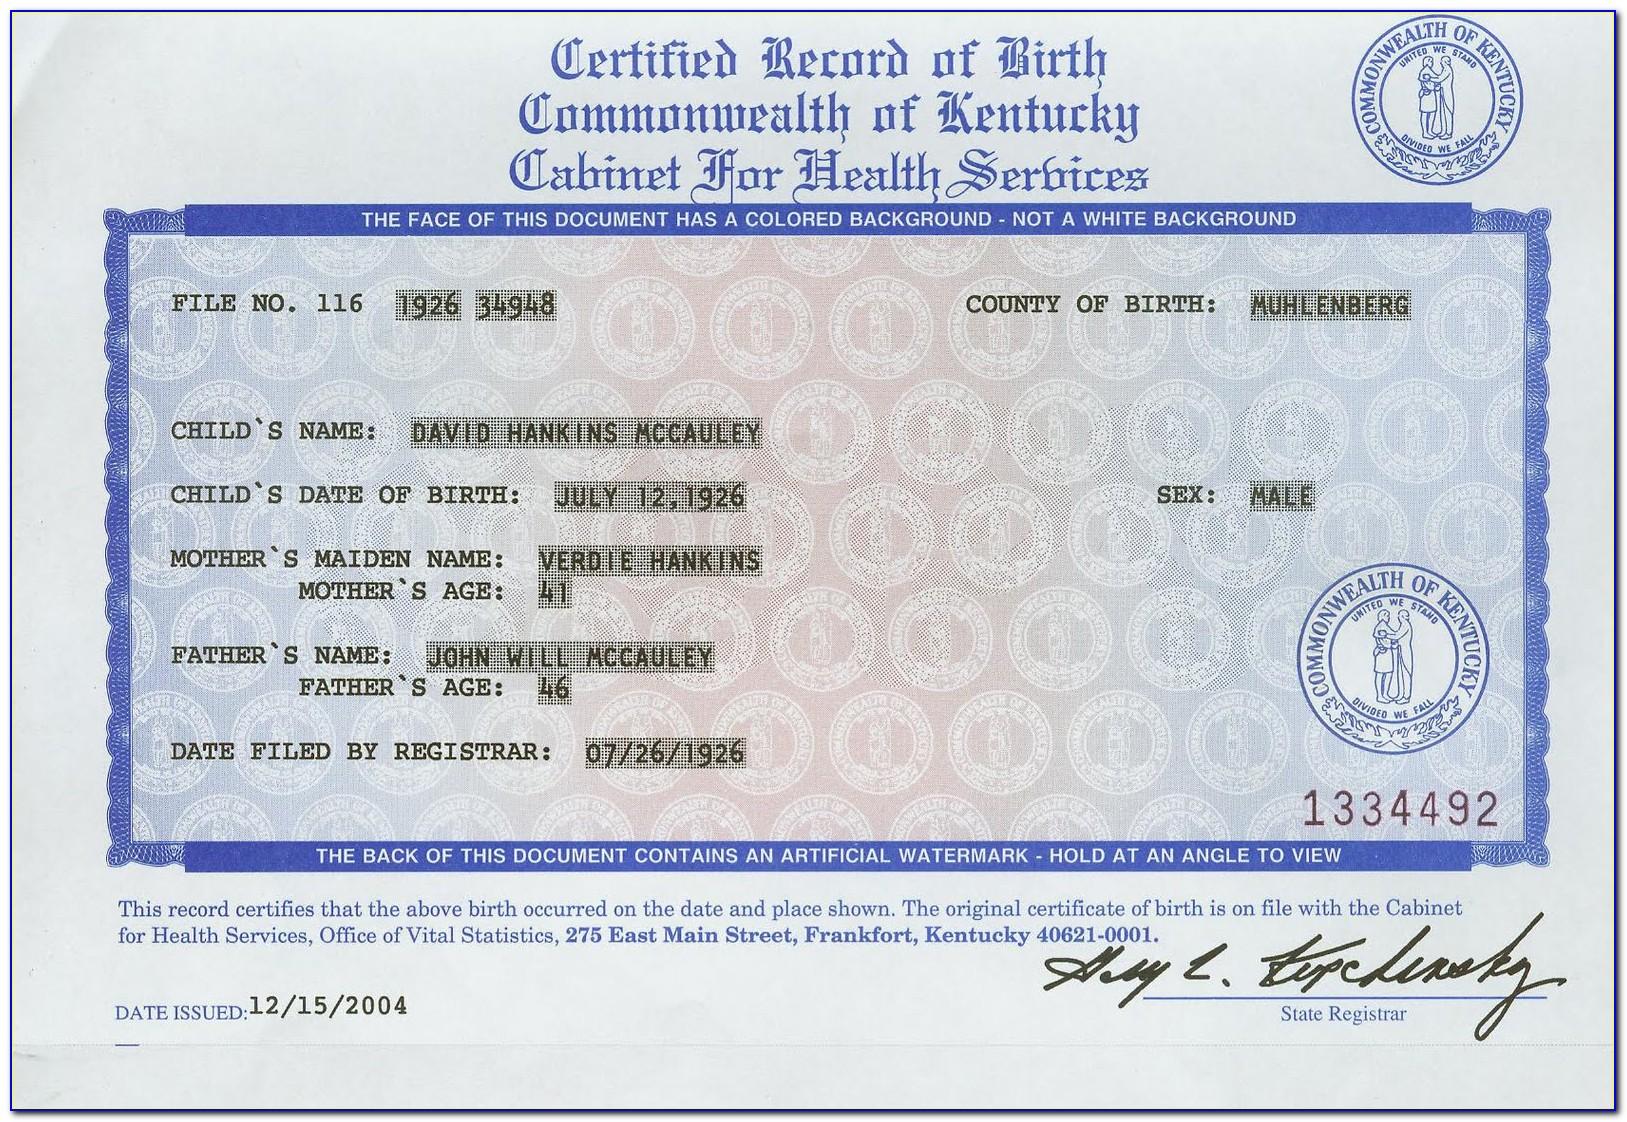 Kentucky Department Vital Statistics Birth Certificate